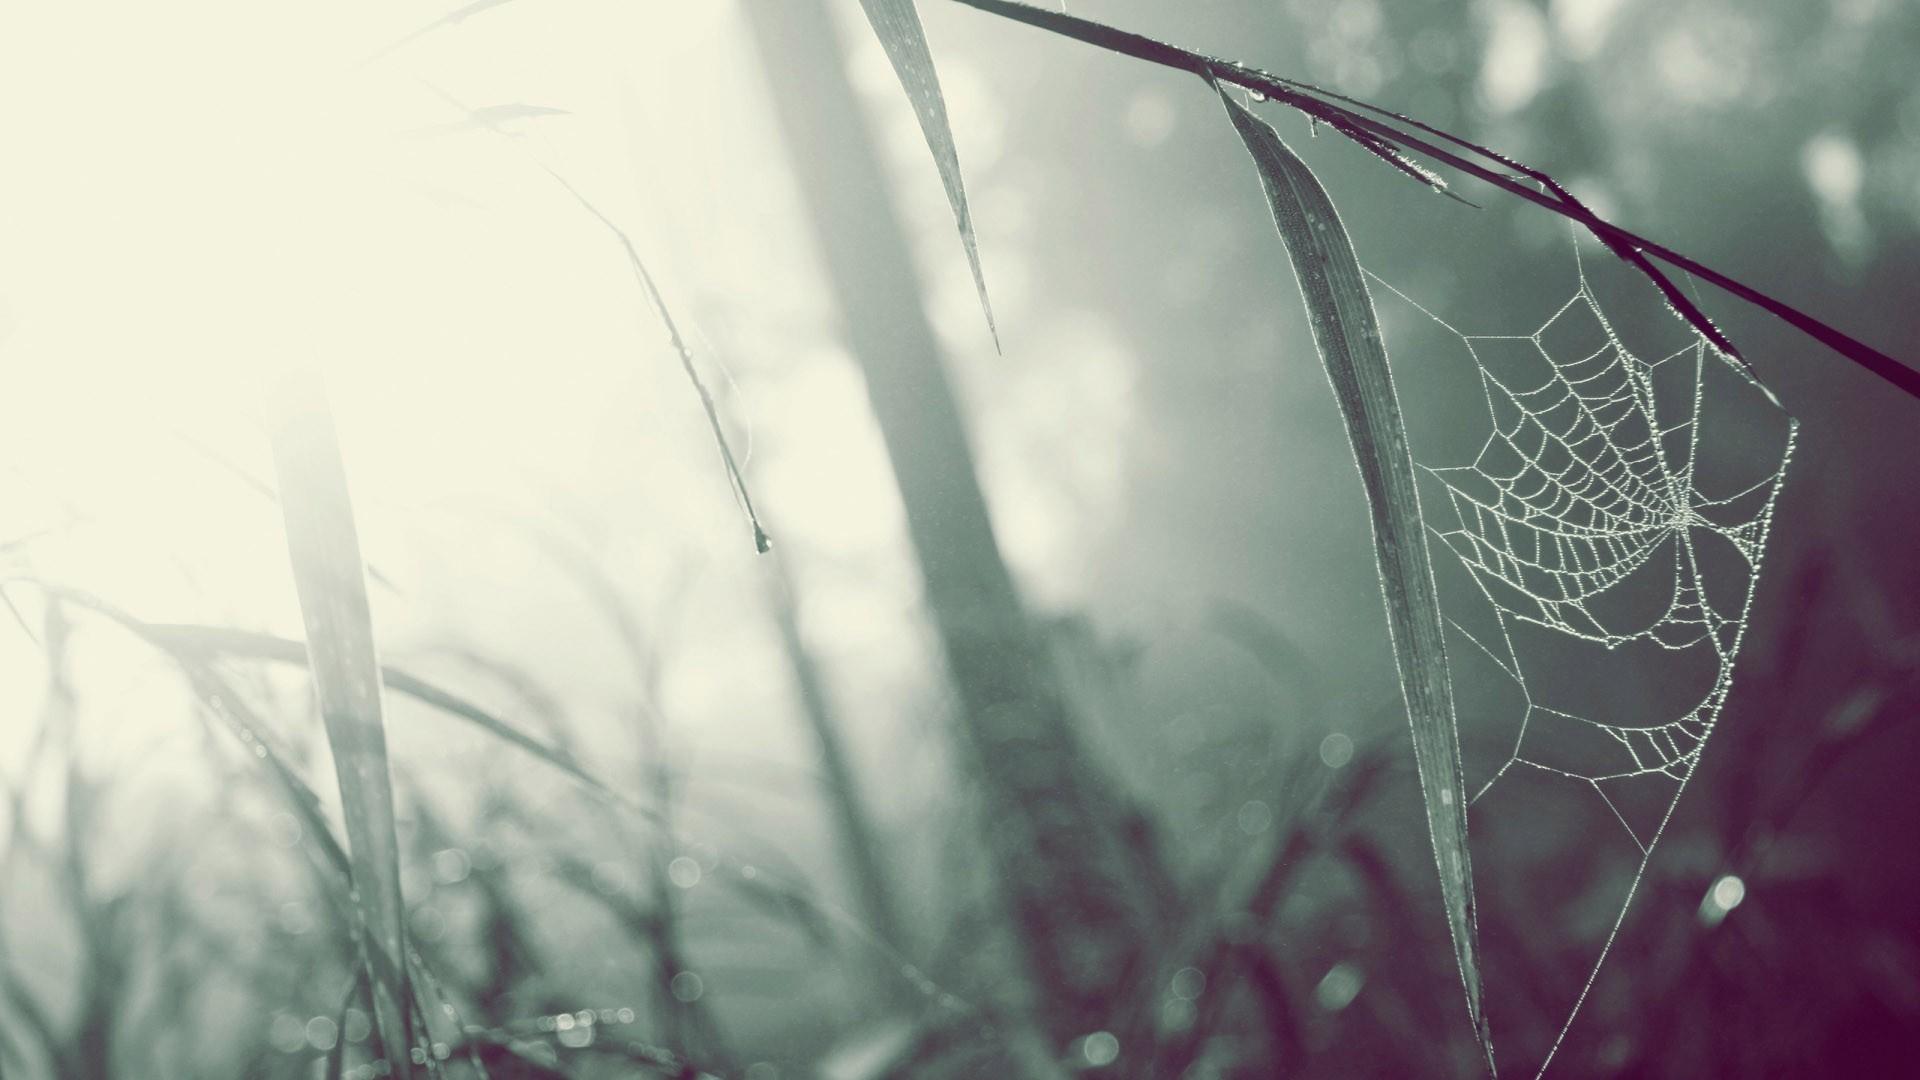 Spider Web Wallpaper 41574